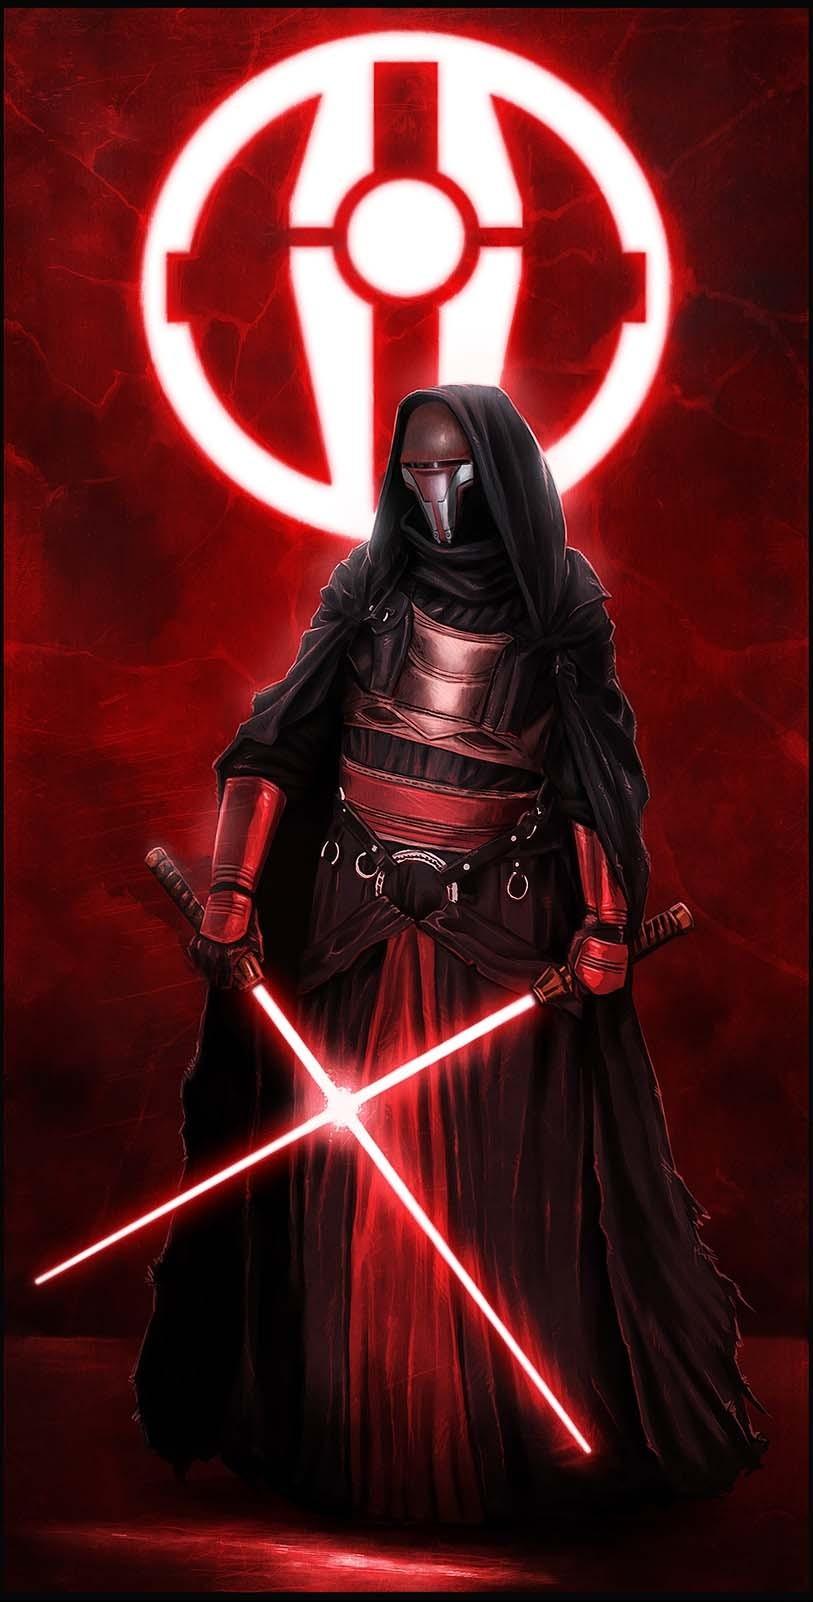 Star Wars Darth Revan Lightsaber Lichtschwert Sith Lord Lowbirdcom 813x1602